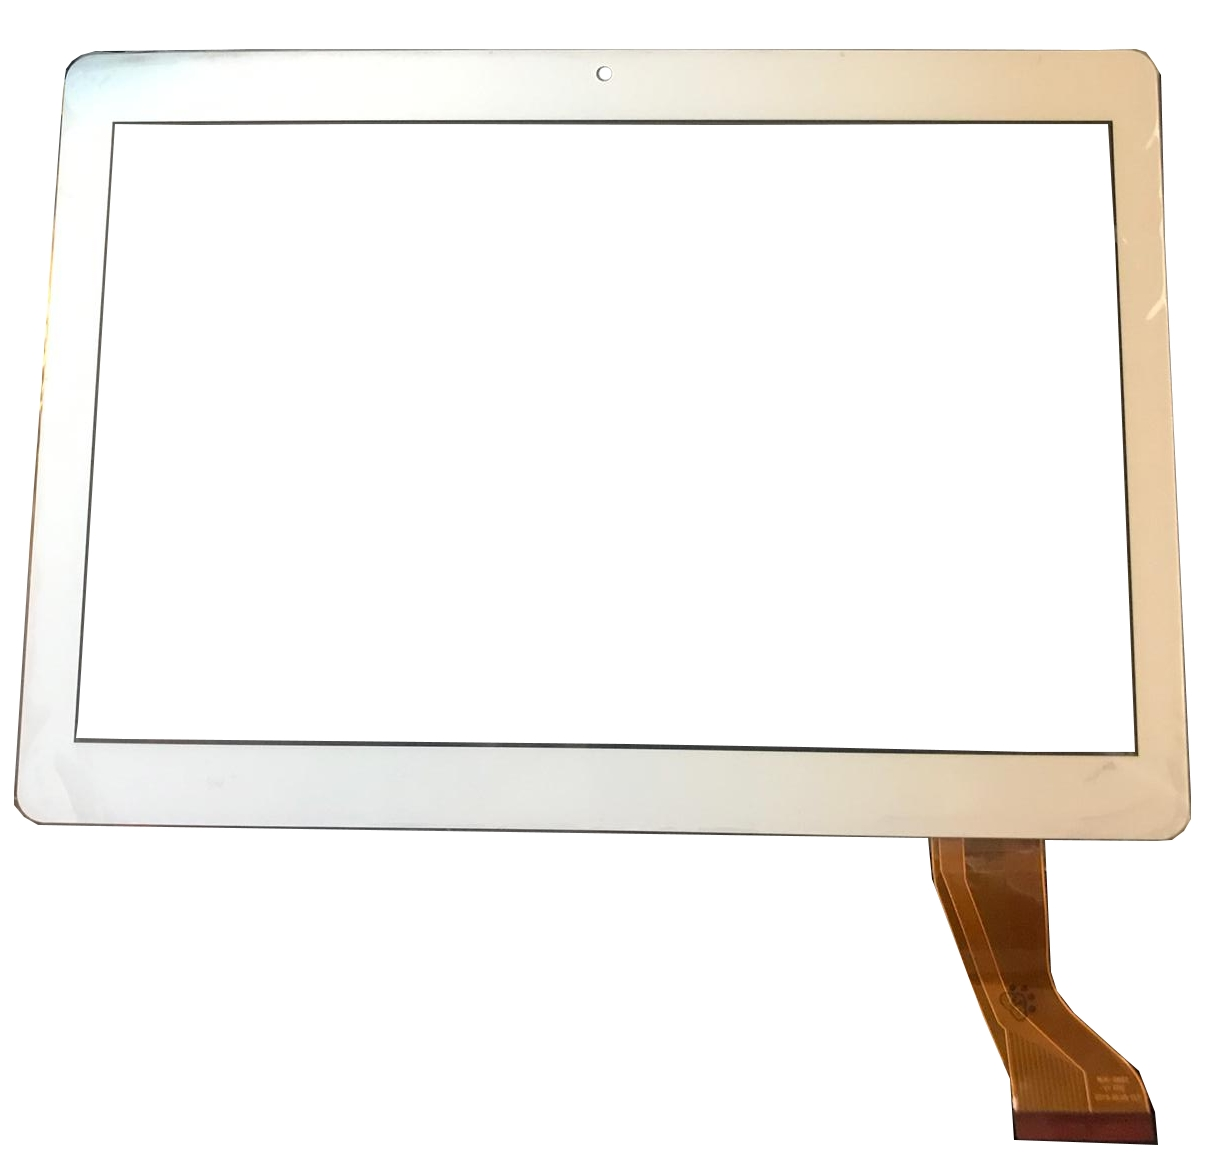 Touchscreen Digitizer Trekstor SurfTab Xiron 10.1 ST10416 1 Geam Sticla Tableta imagine powerlaptop.ro 2021